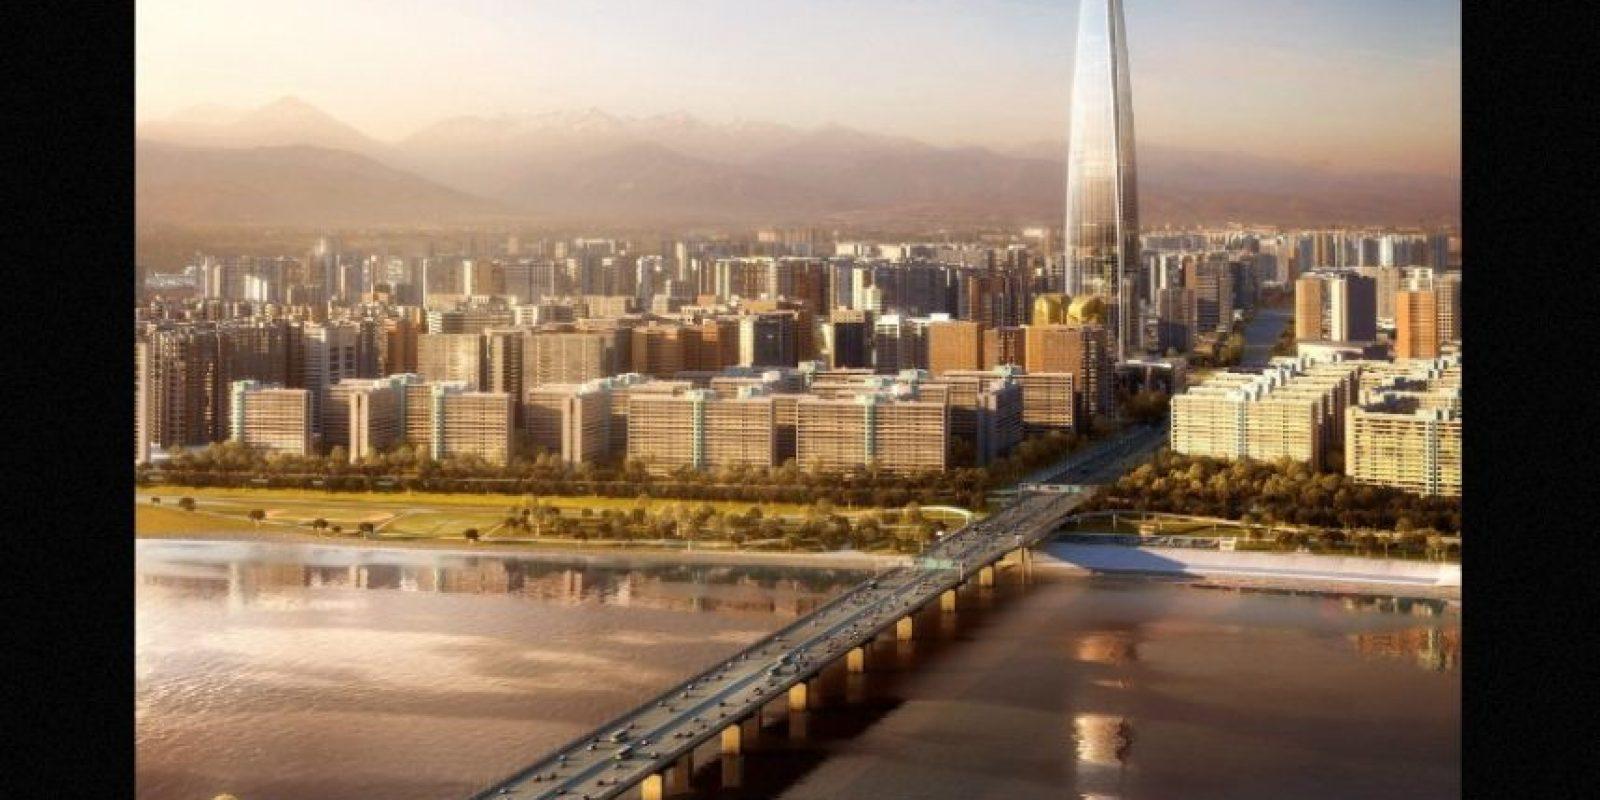 7. Lotte World Tower (Corea del Sur) – 123 pisos – 554 metros (1819 pies) de altura Foto:Kohn Pedersen – Skyscrapercenter.com